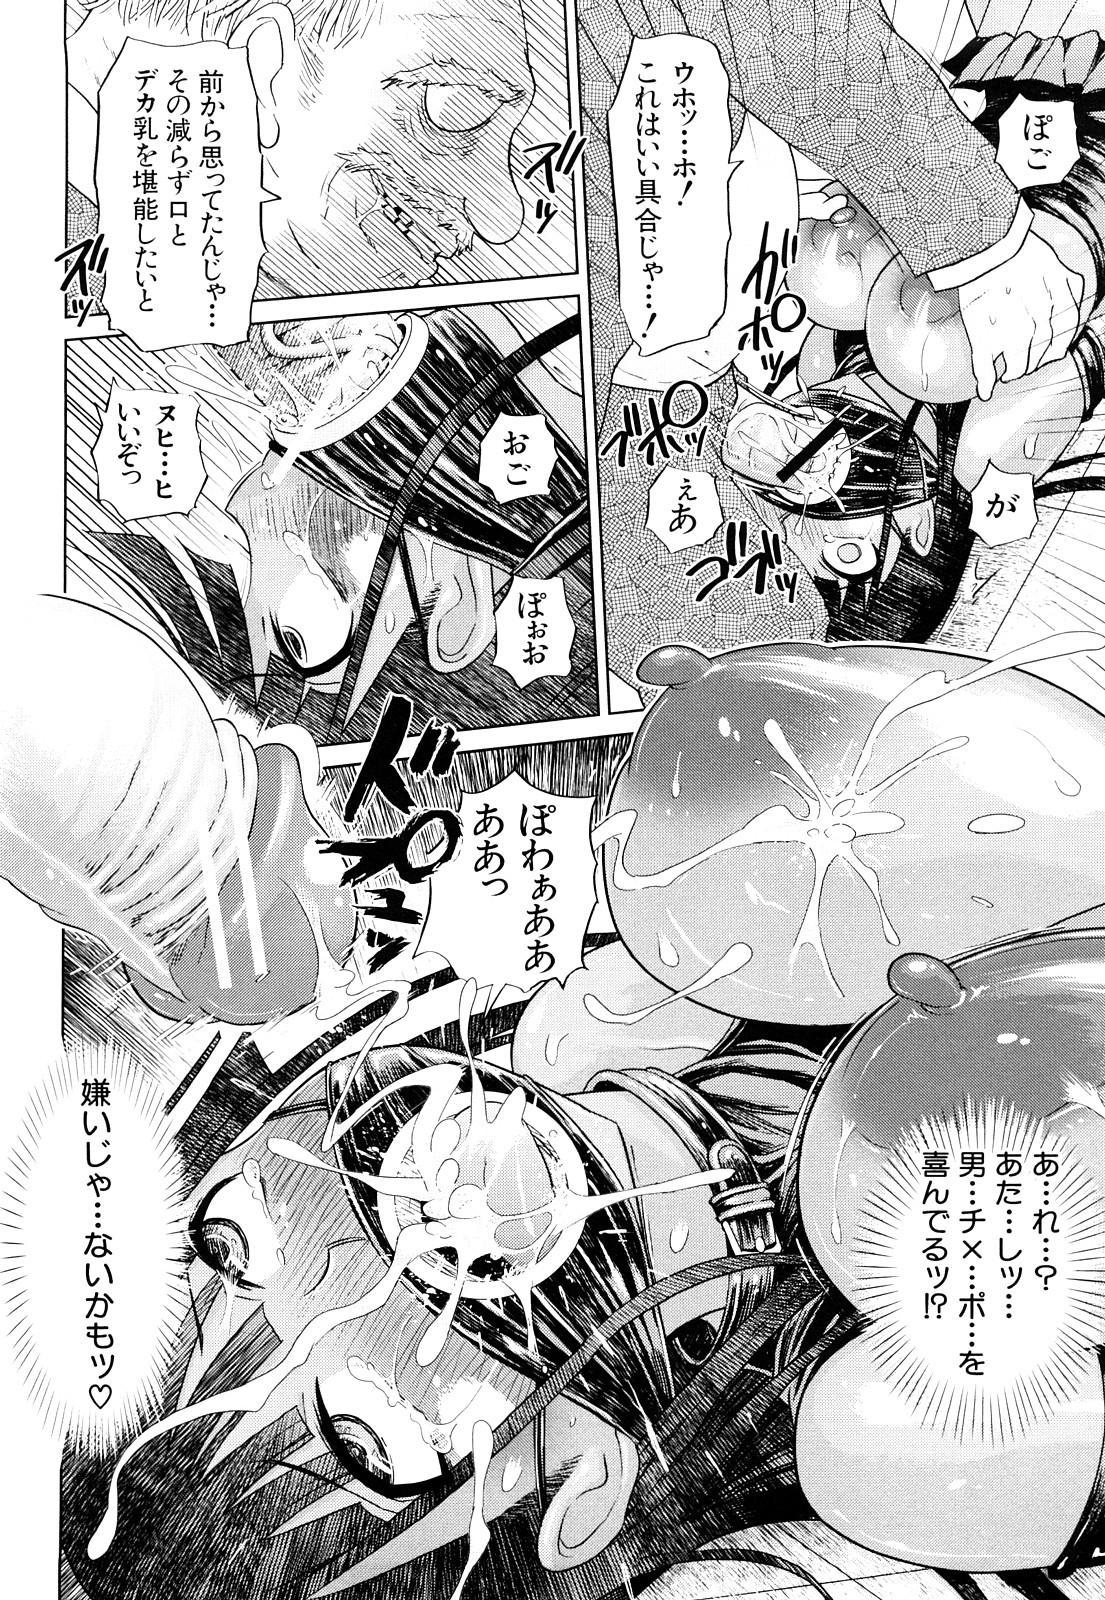 Seifuku Mesubuta Chitai - The Nymphomaniac Zone 112